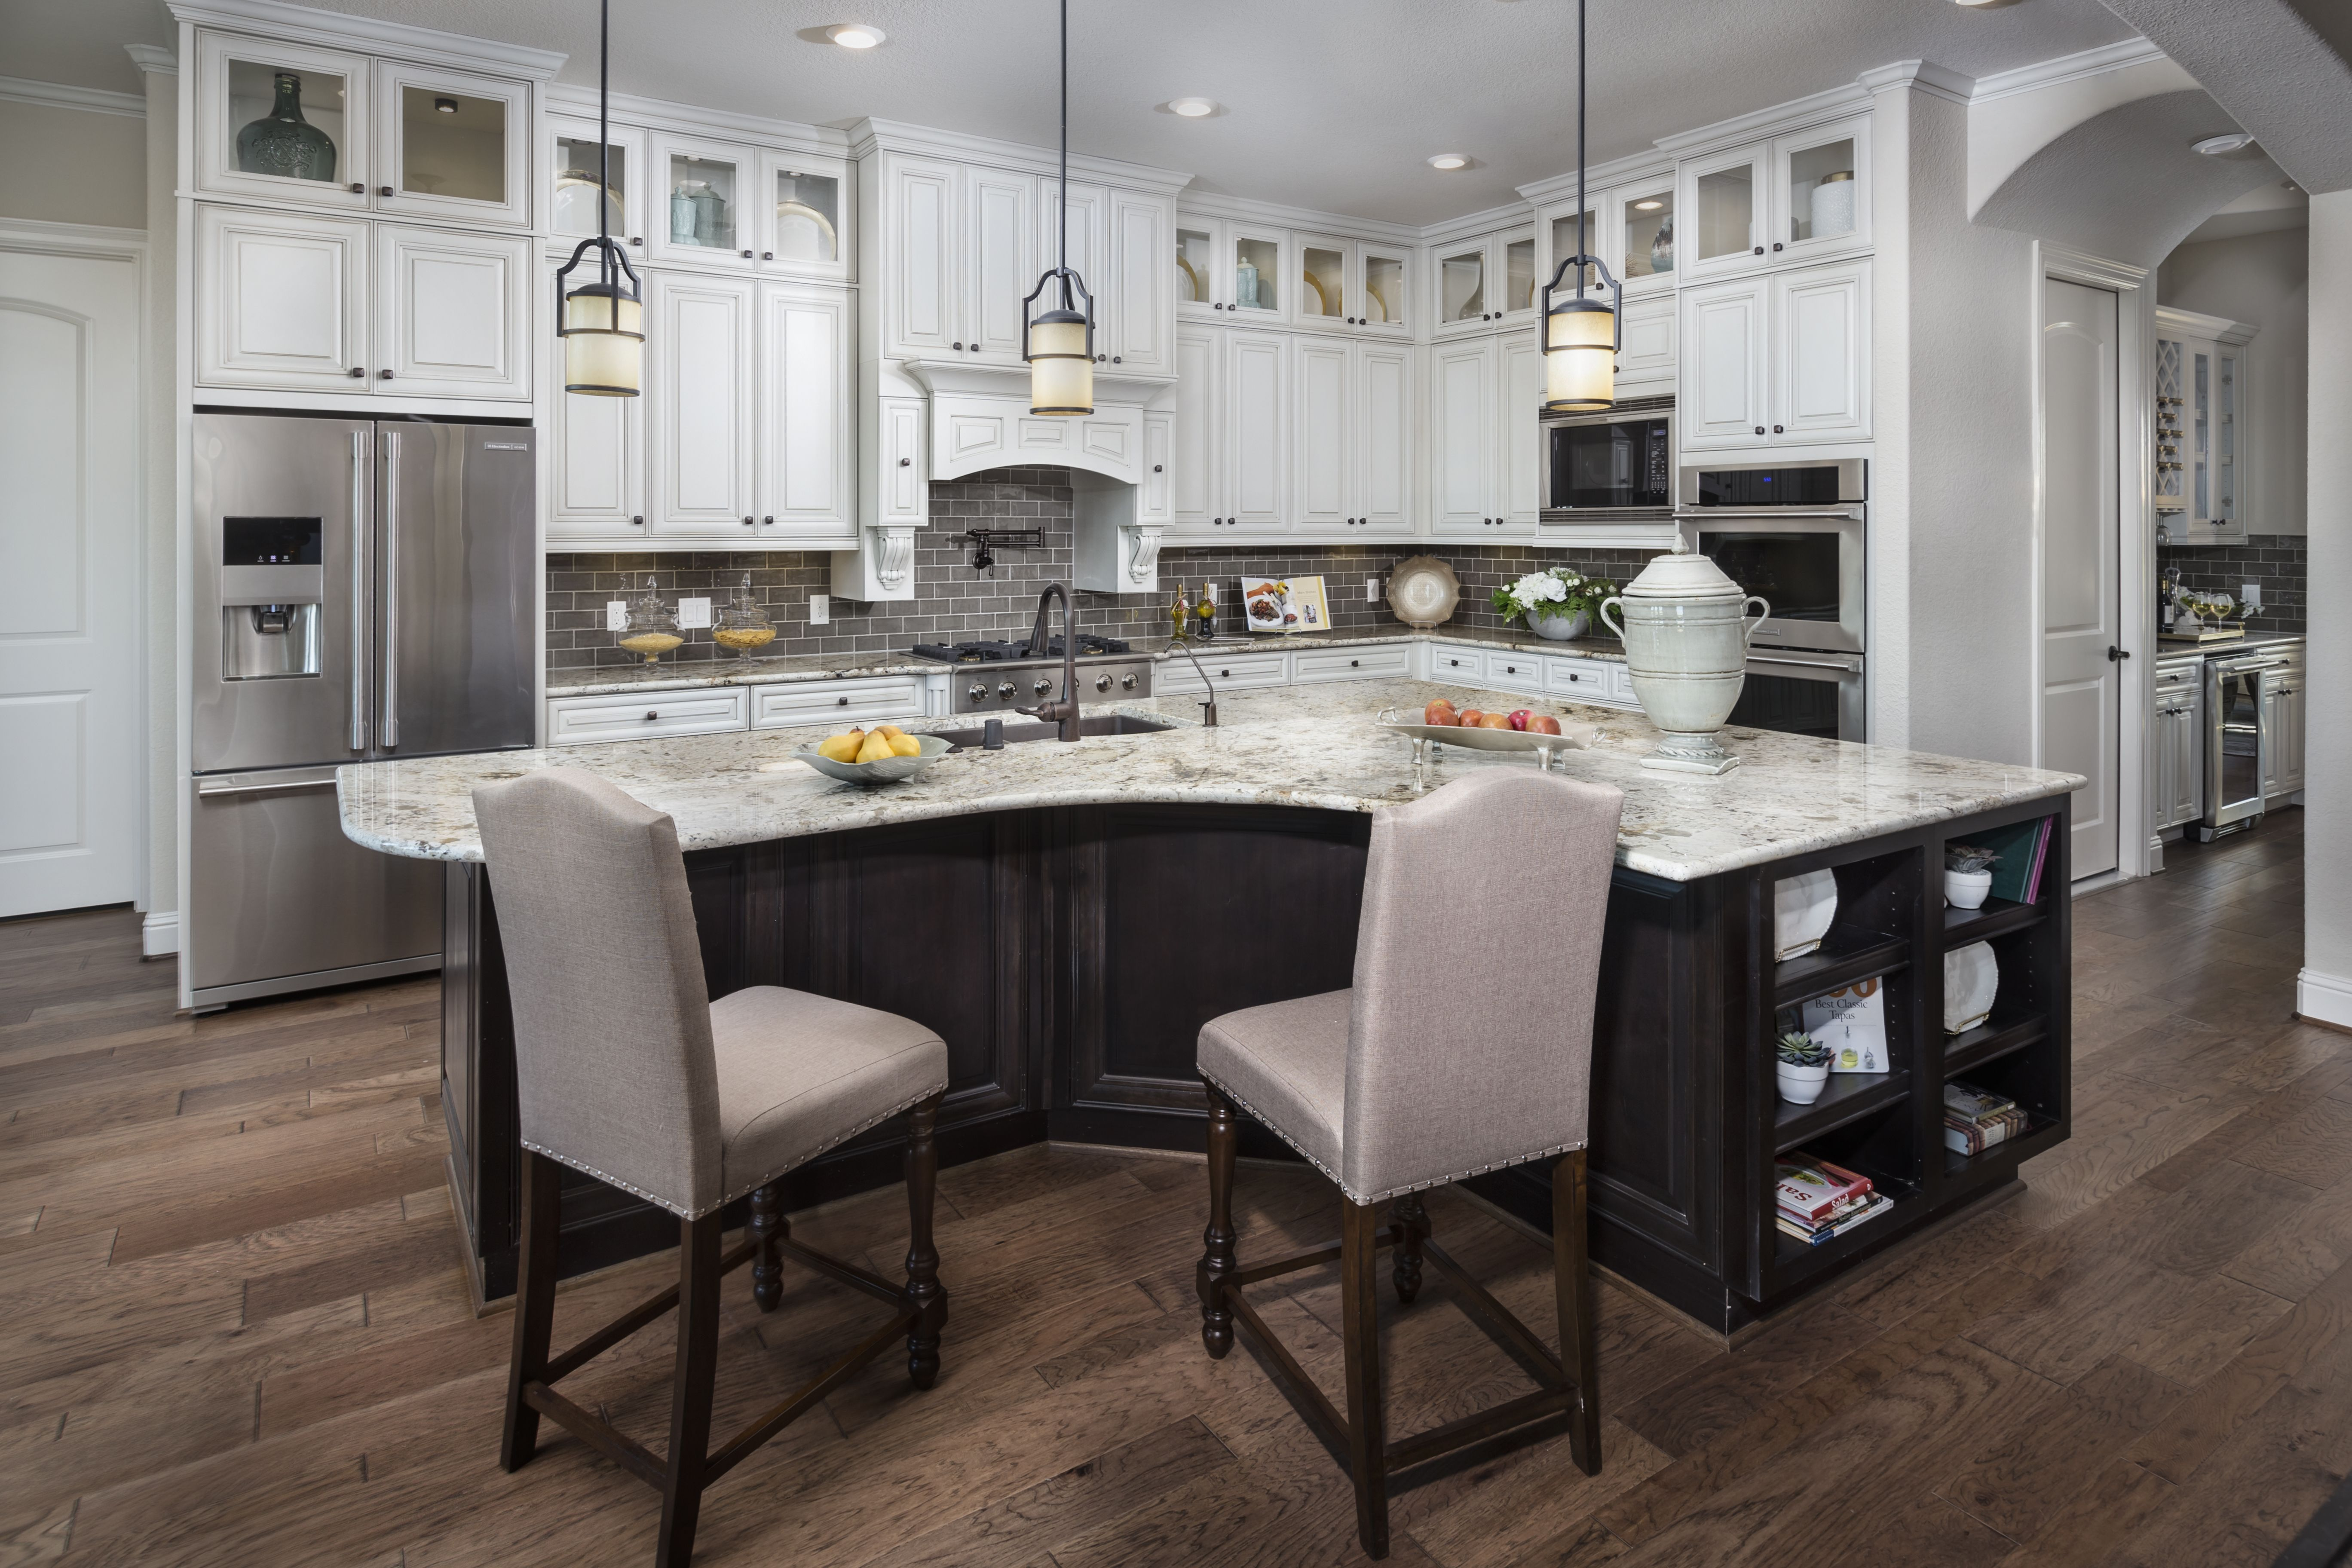 Elegant Granite top Kitchen island with Stools